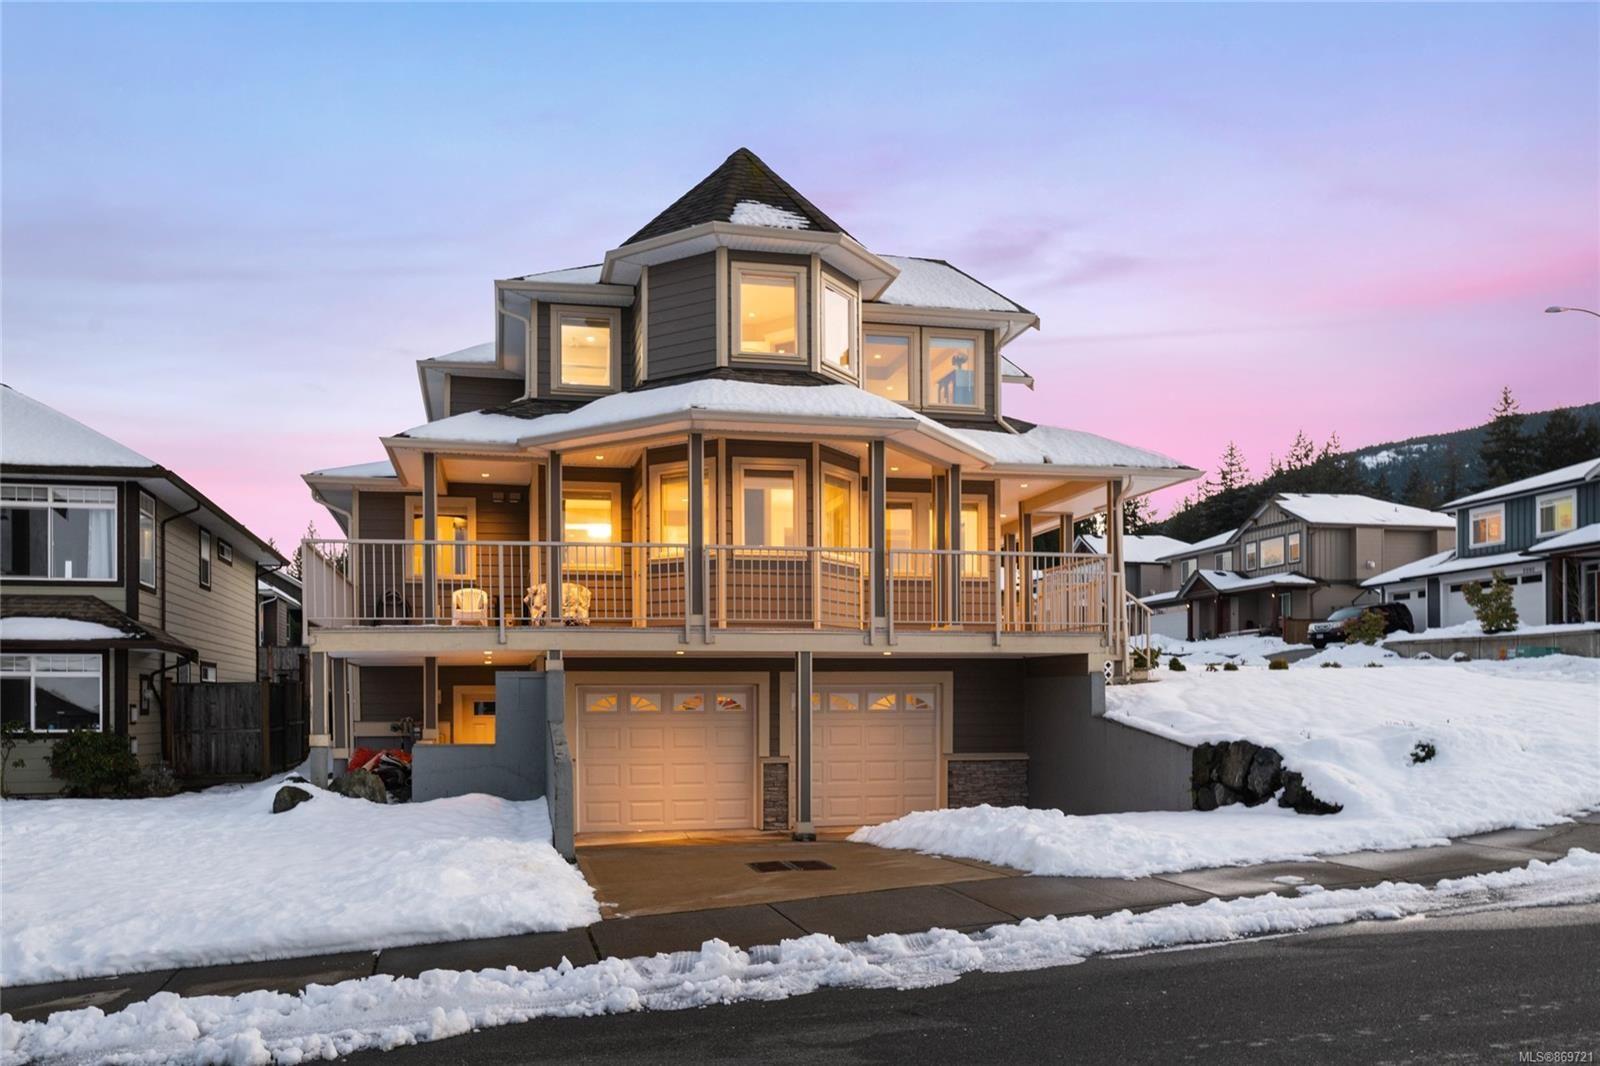 Photo 36: Photos: 2259 Leighton Rd in : Na South Jingle Pot House for sale (Nanaimo)  : MLS®# 869721